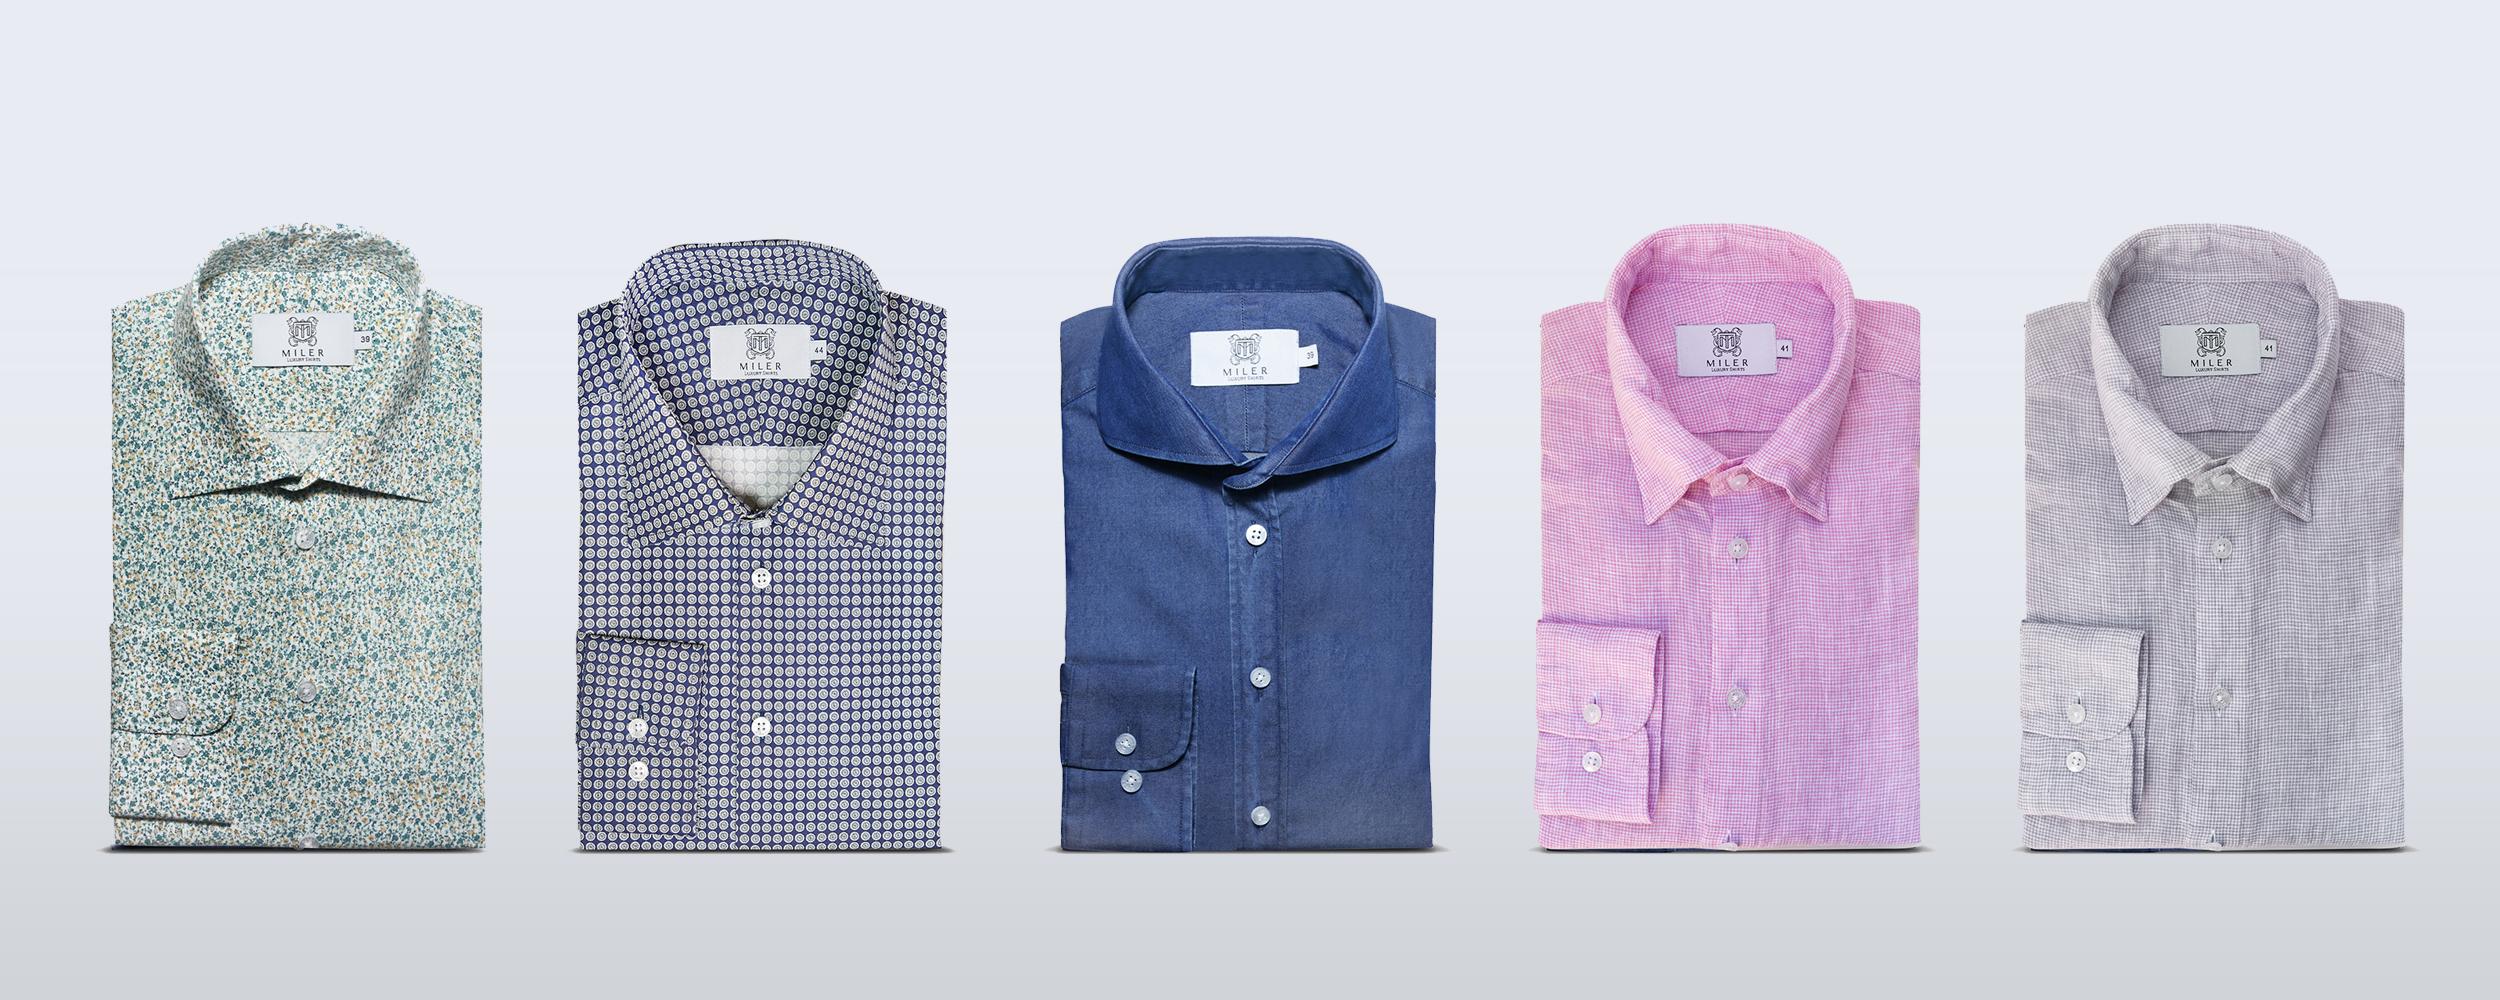 Nowa kolekcja koszul MILER!